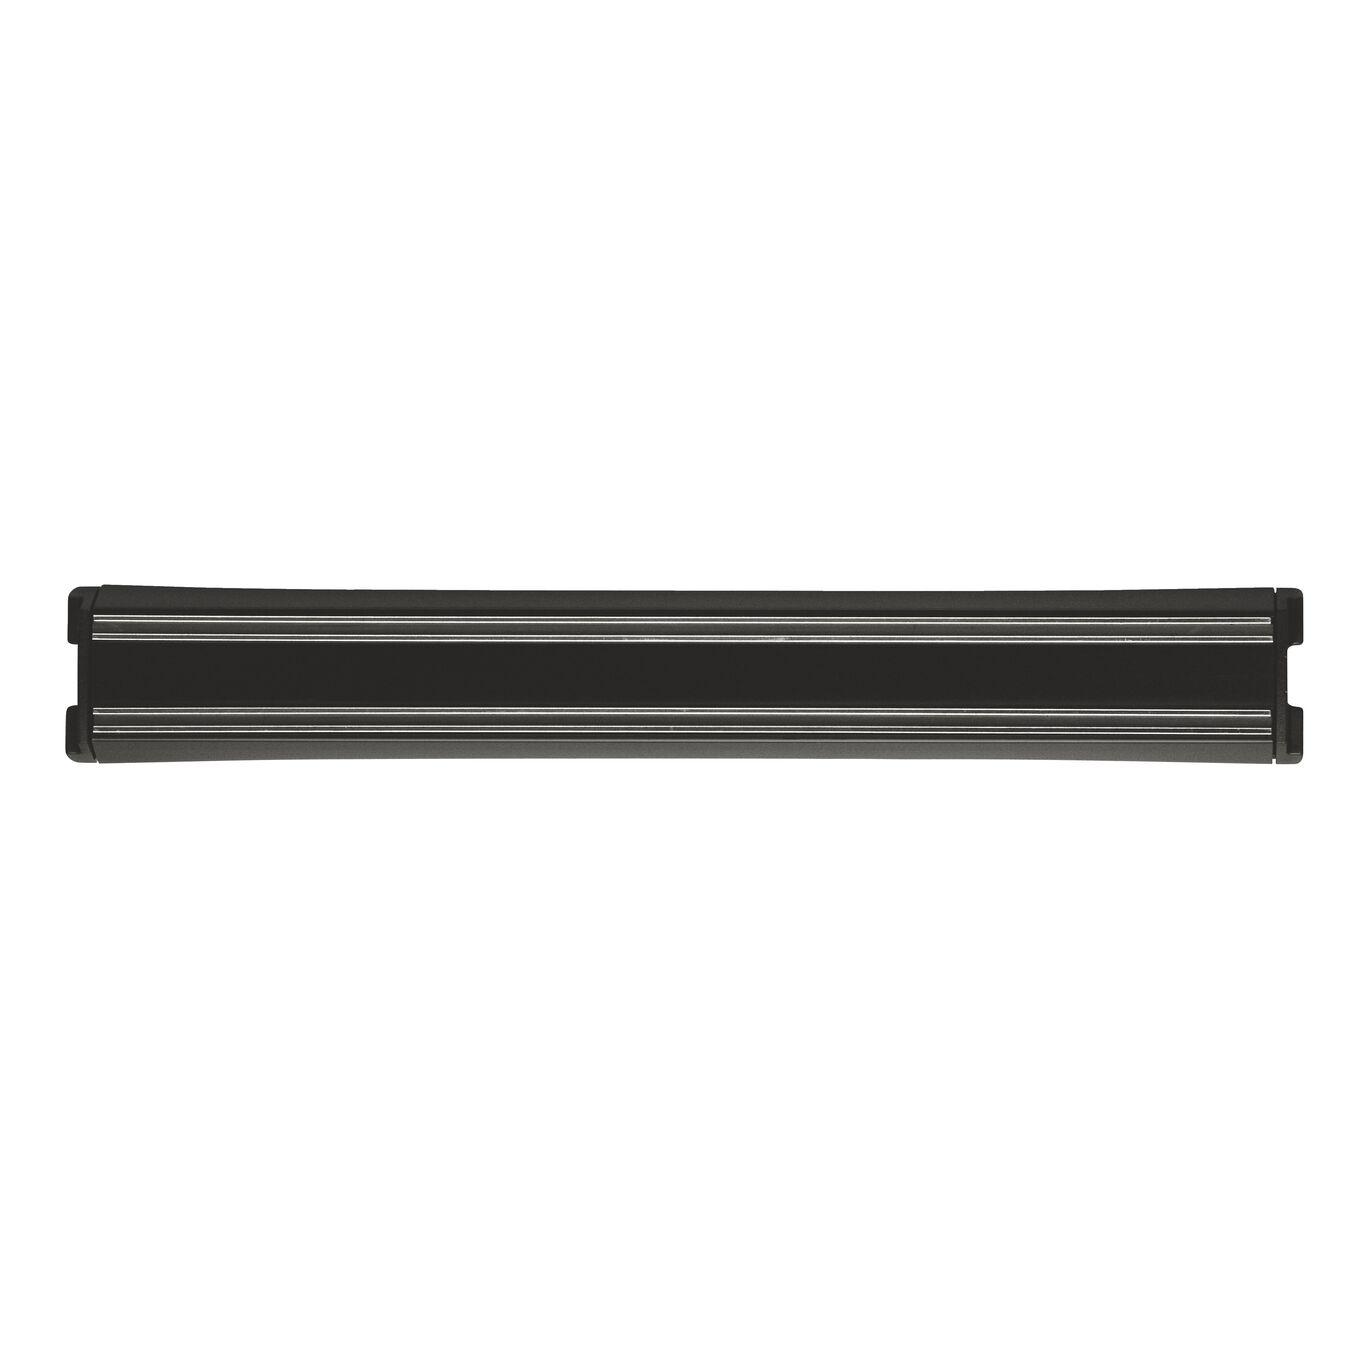 Magnetic knife bar 30 cm Plastic,,large 1